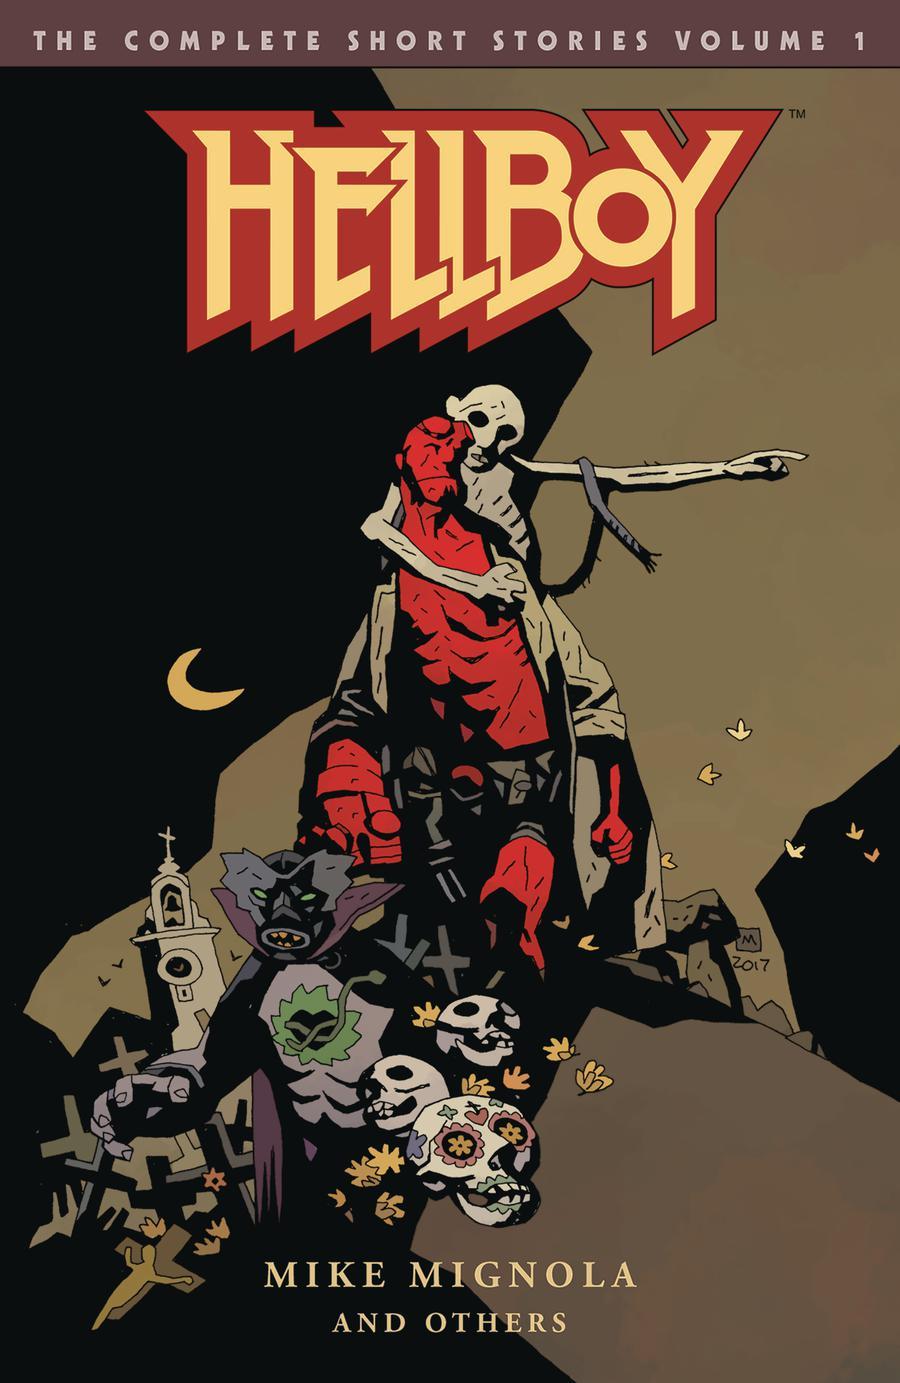 Hellboy Complete Short Stories Vol 1 TP